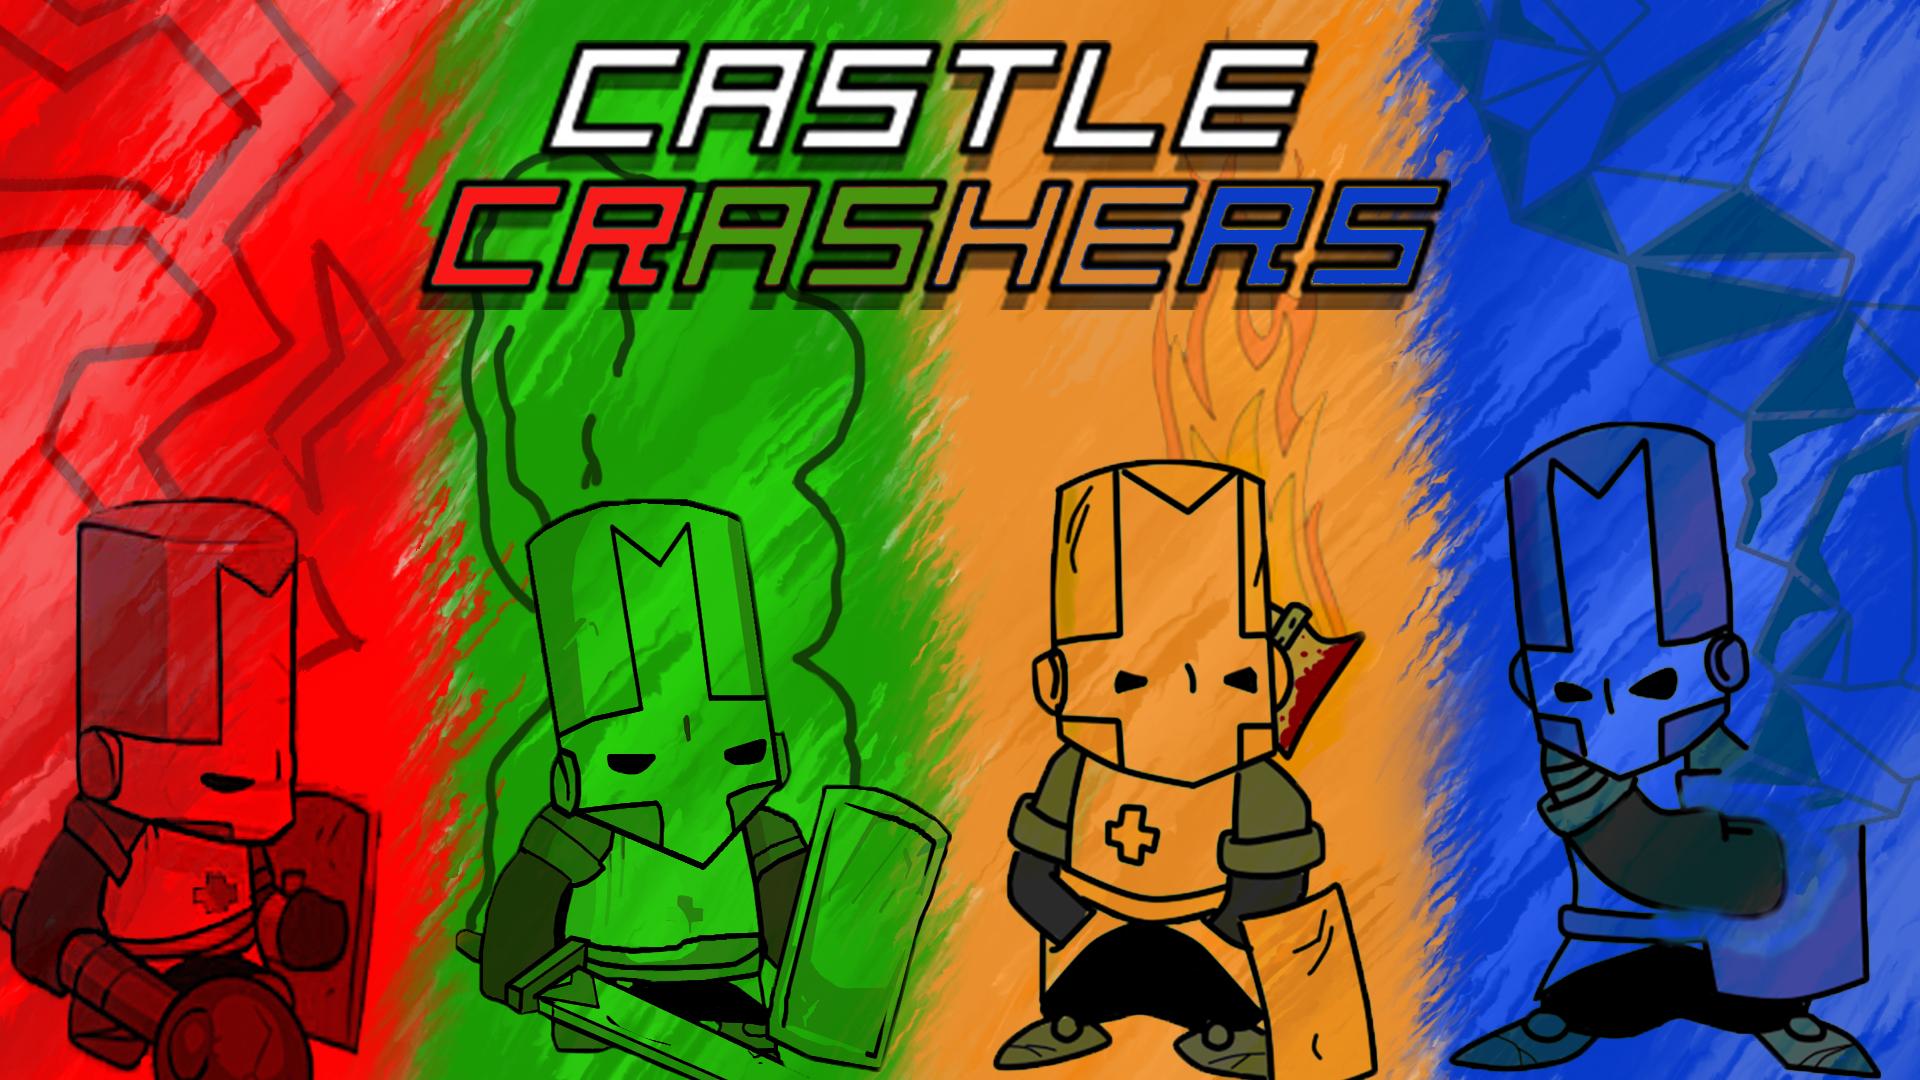 steam community 1920x1080 castle crashers background